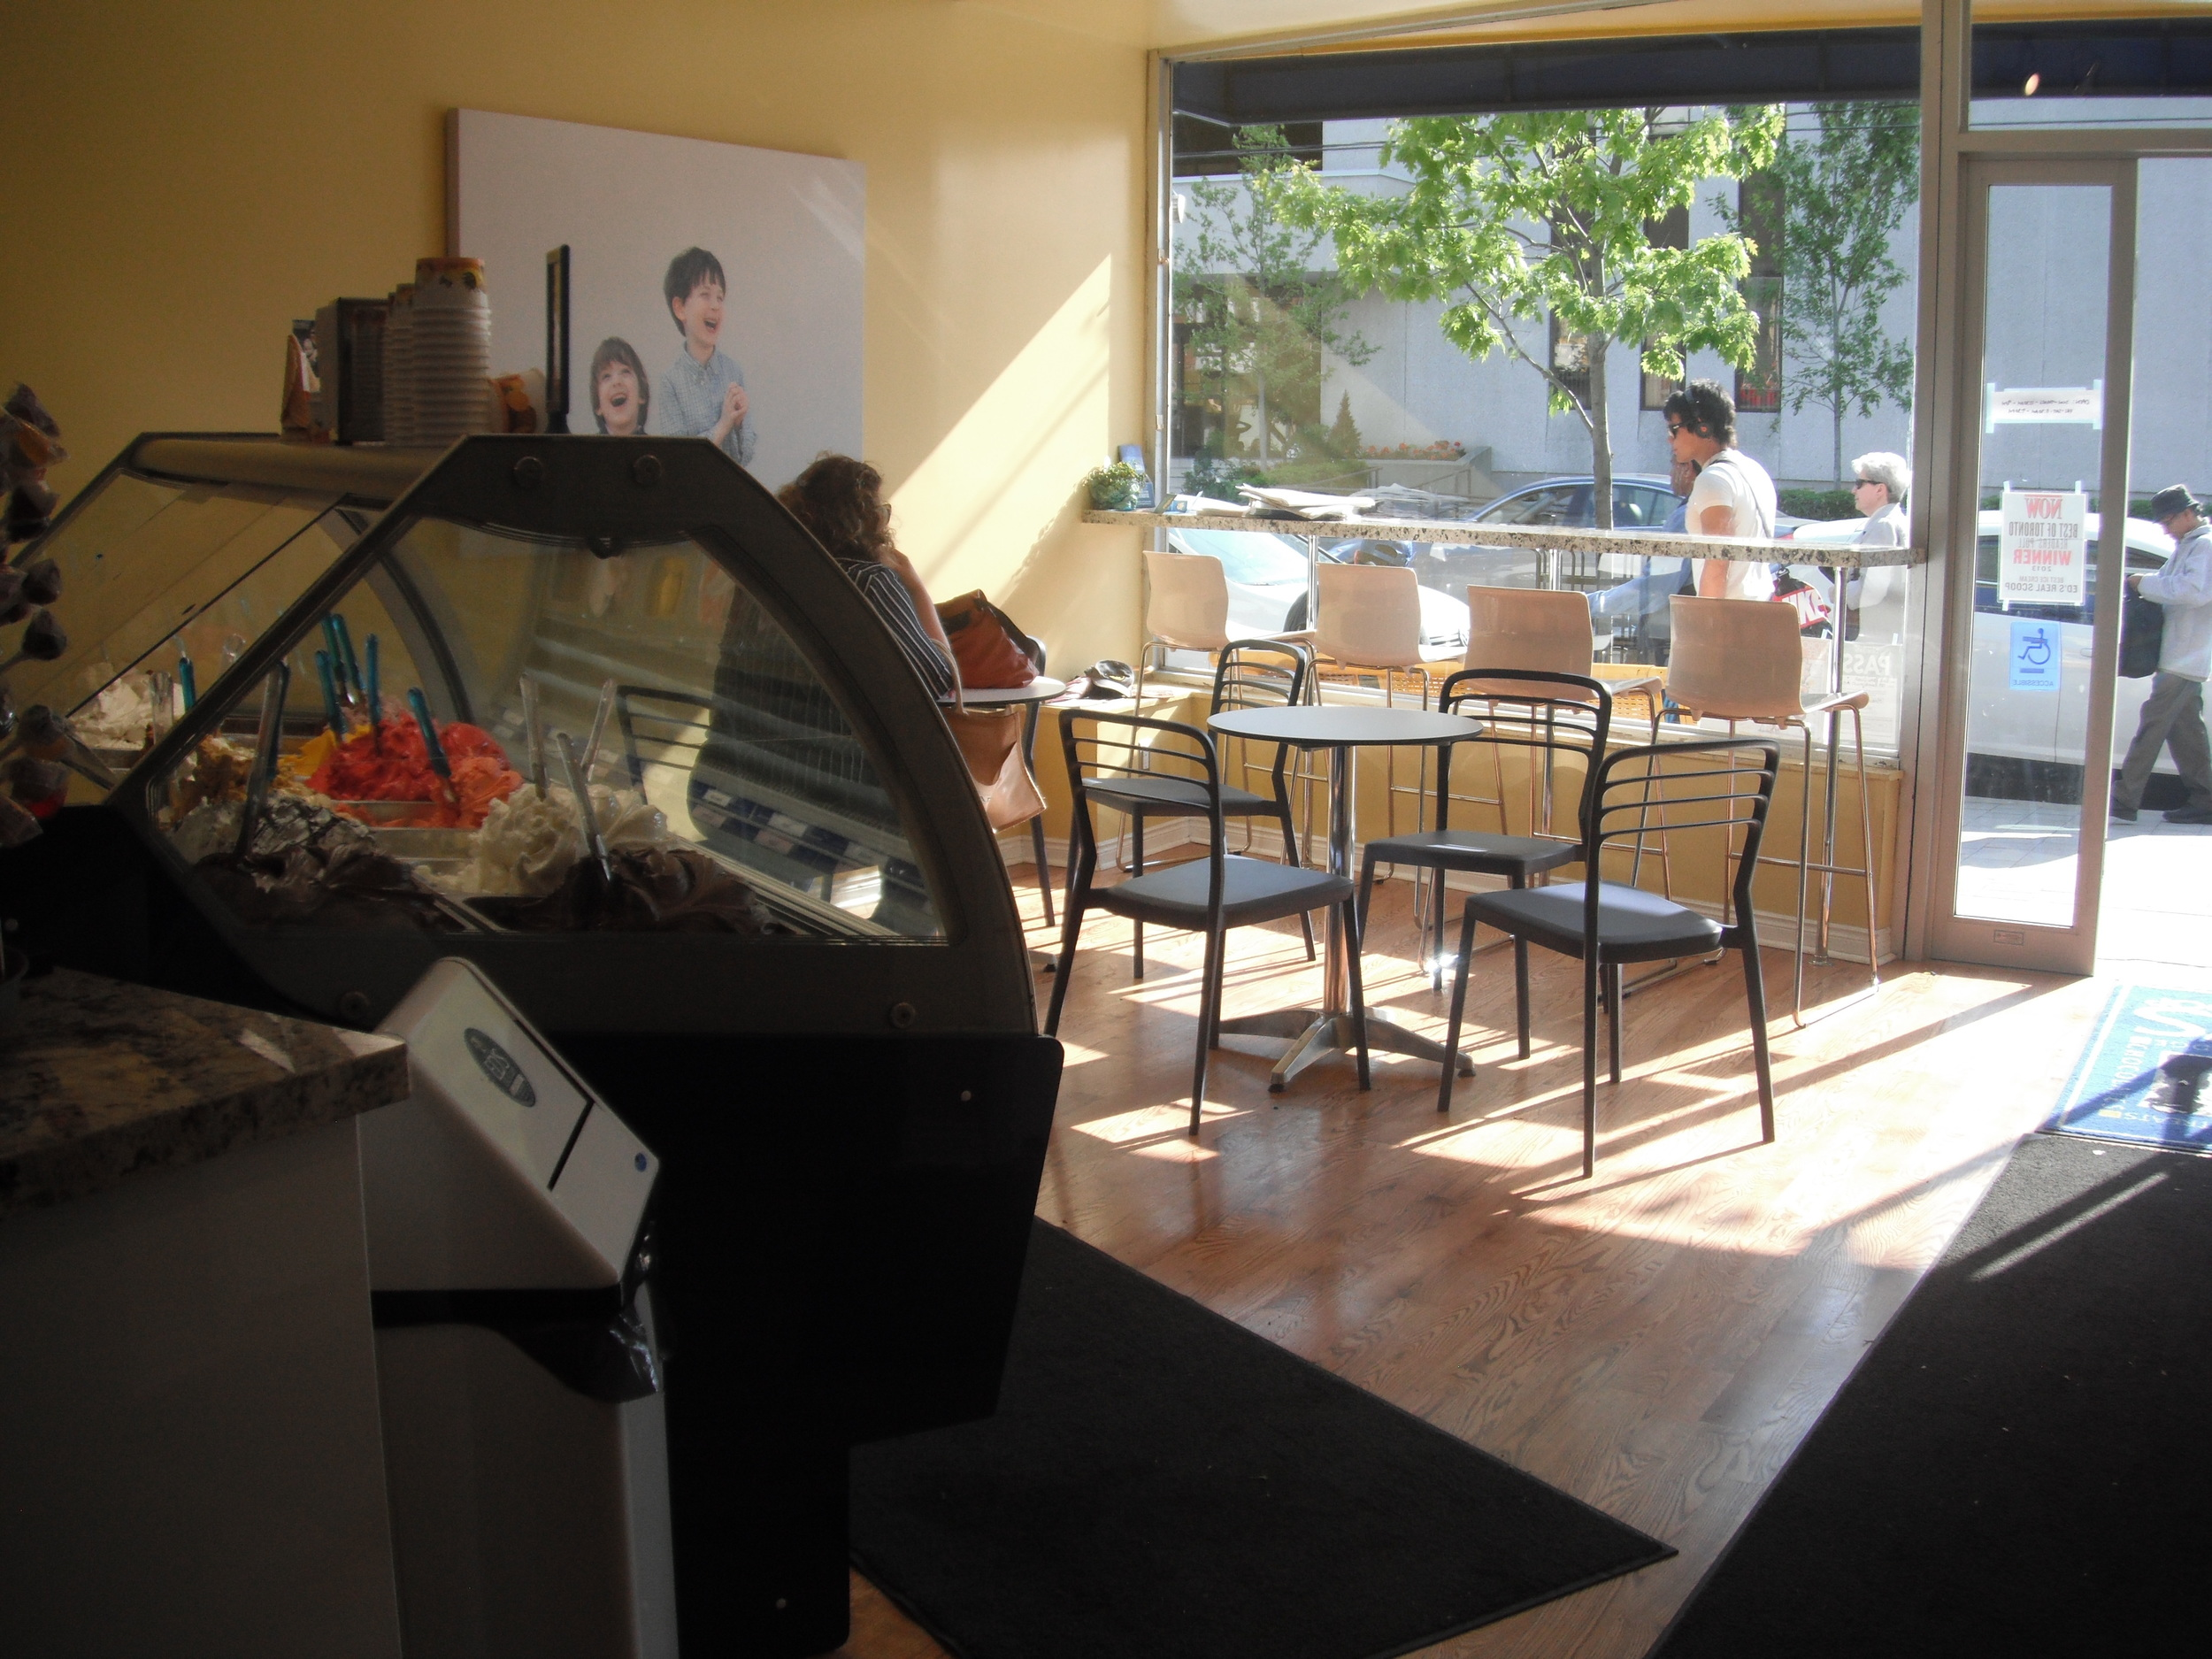 Accessible interior restaurant view.